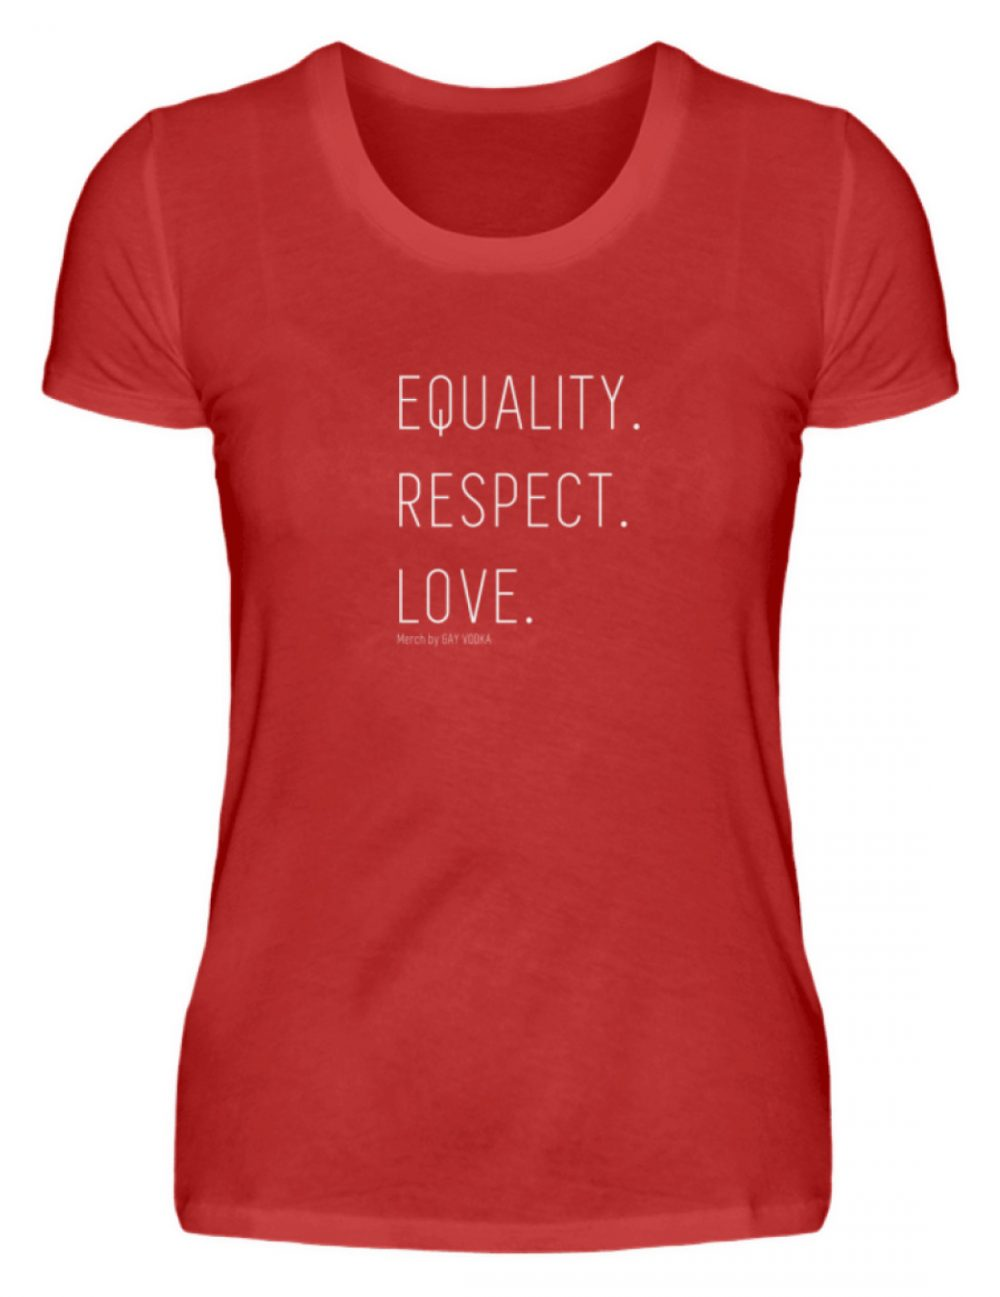 EQUALITY. RESPECT. LOVE. - Damen Premiumshirt-4